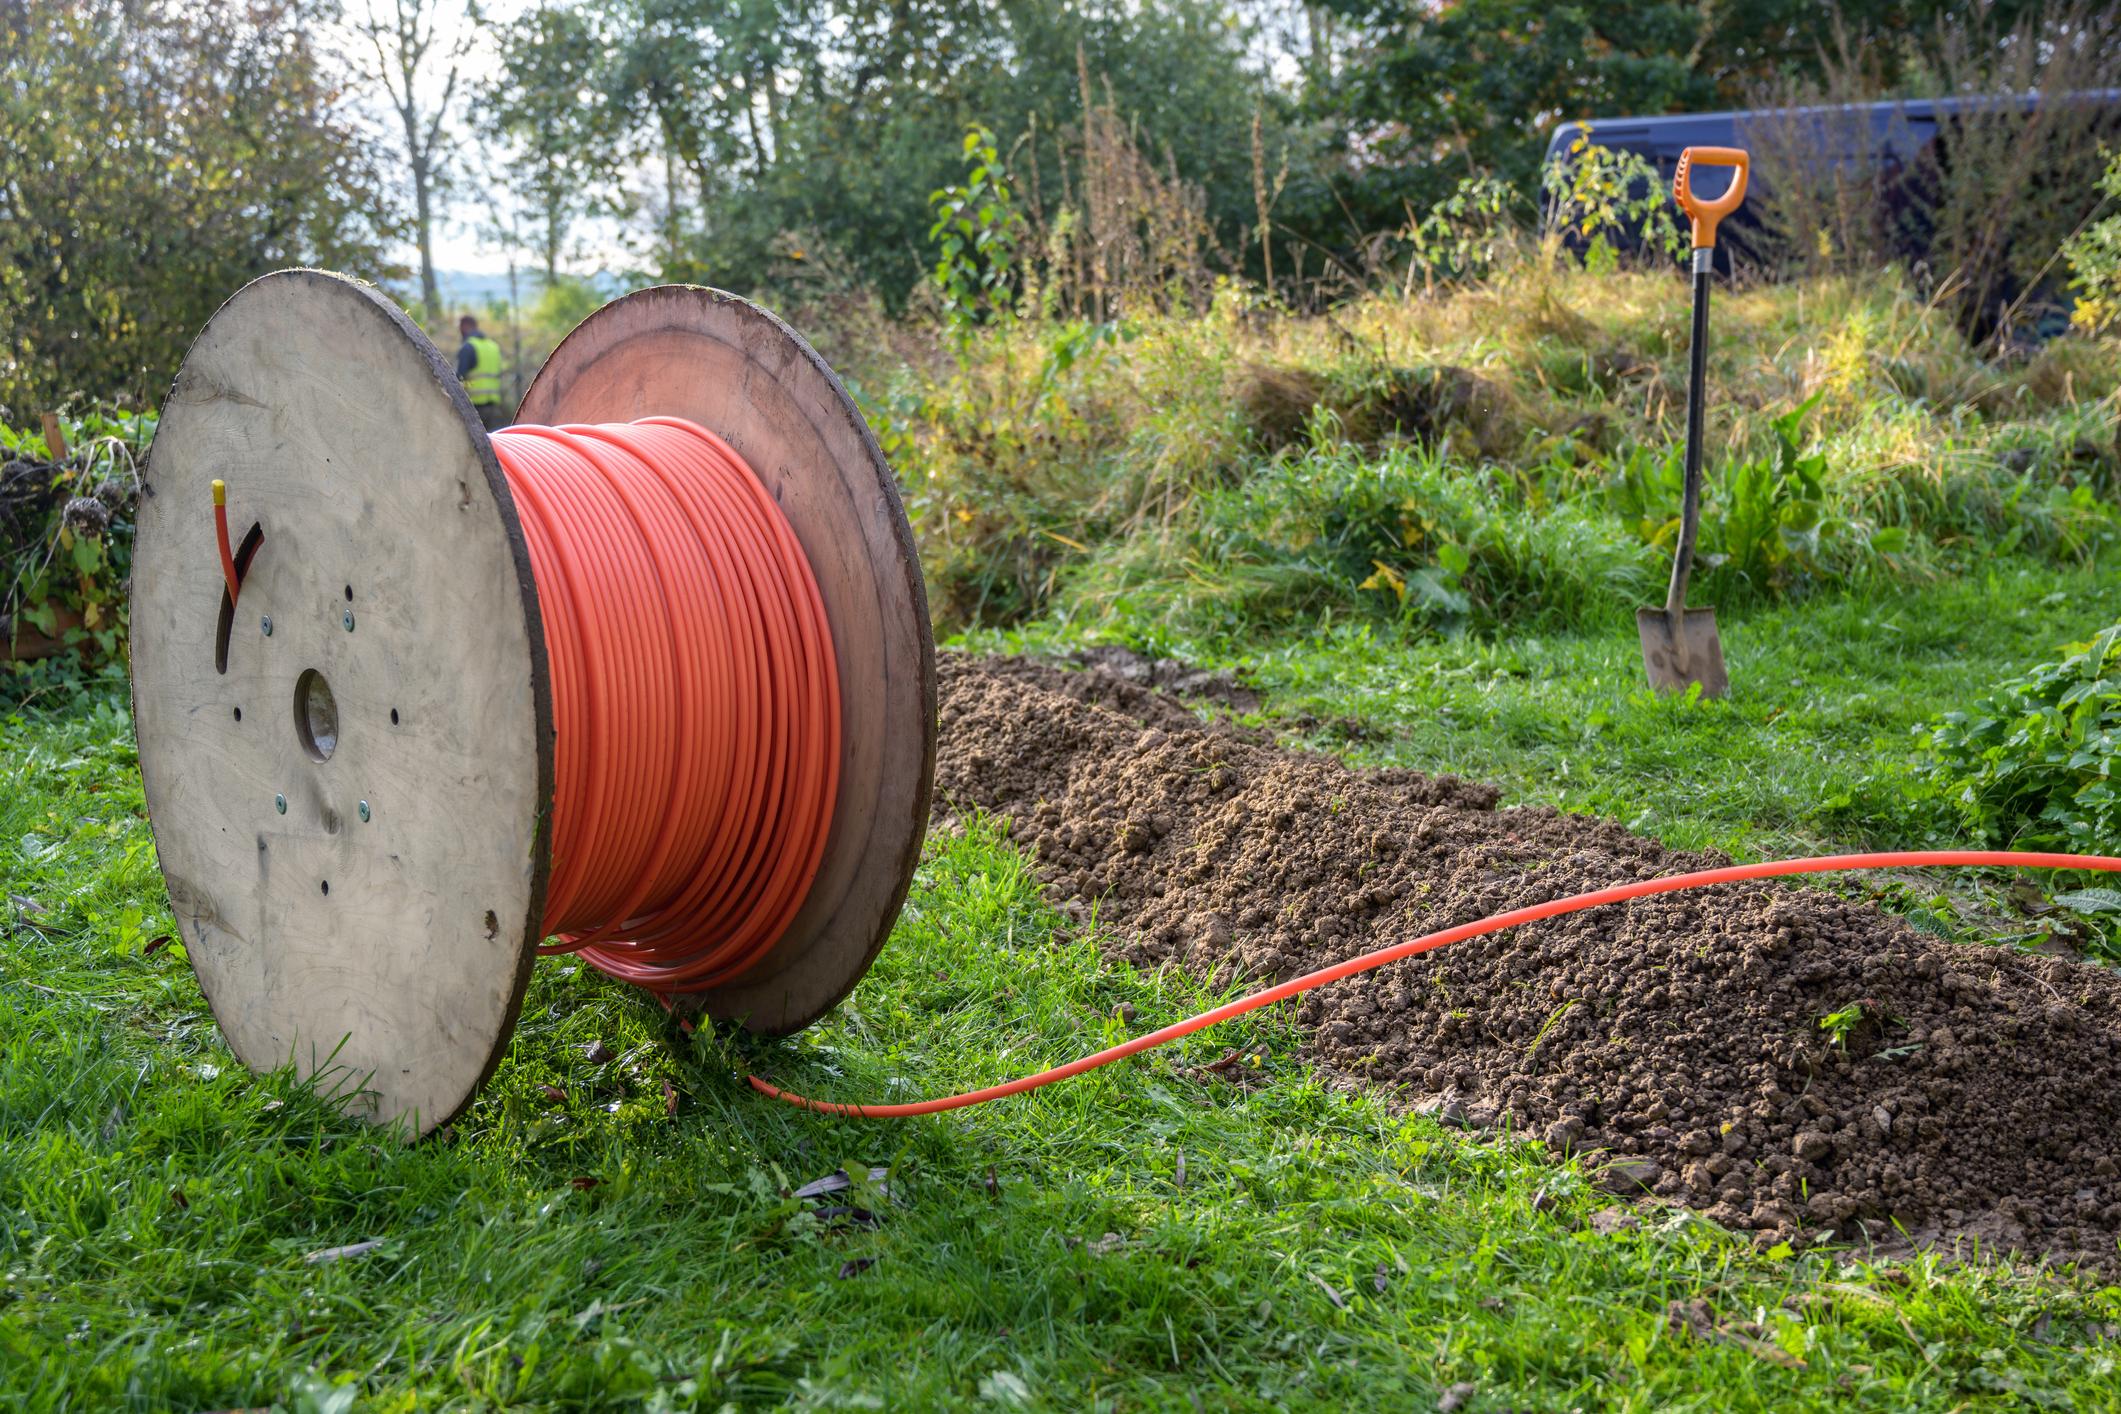 falgatuinen kabel KPN aanleggen